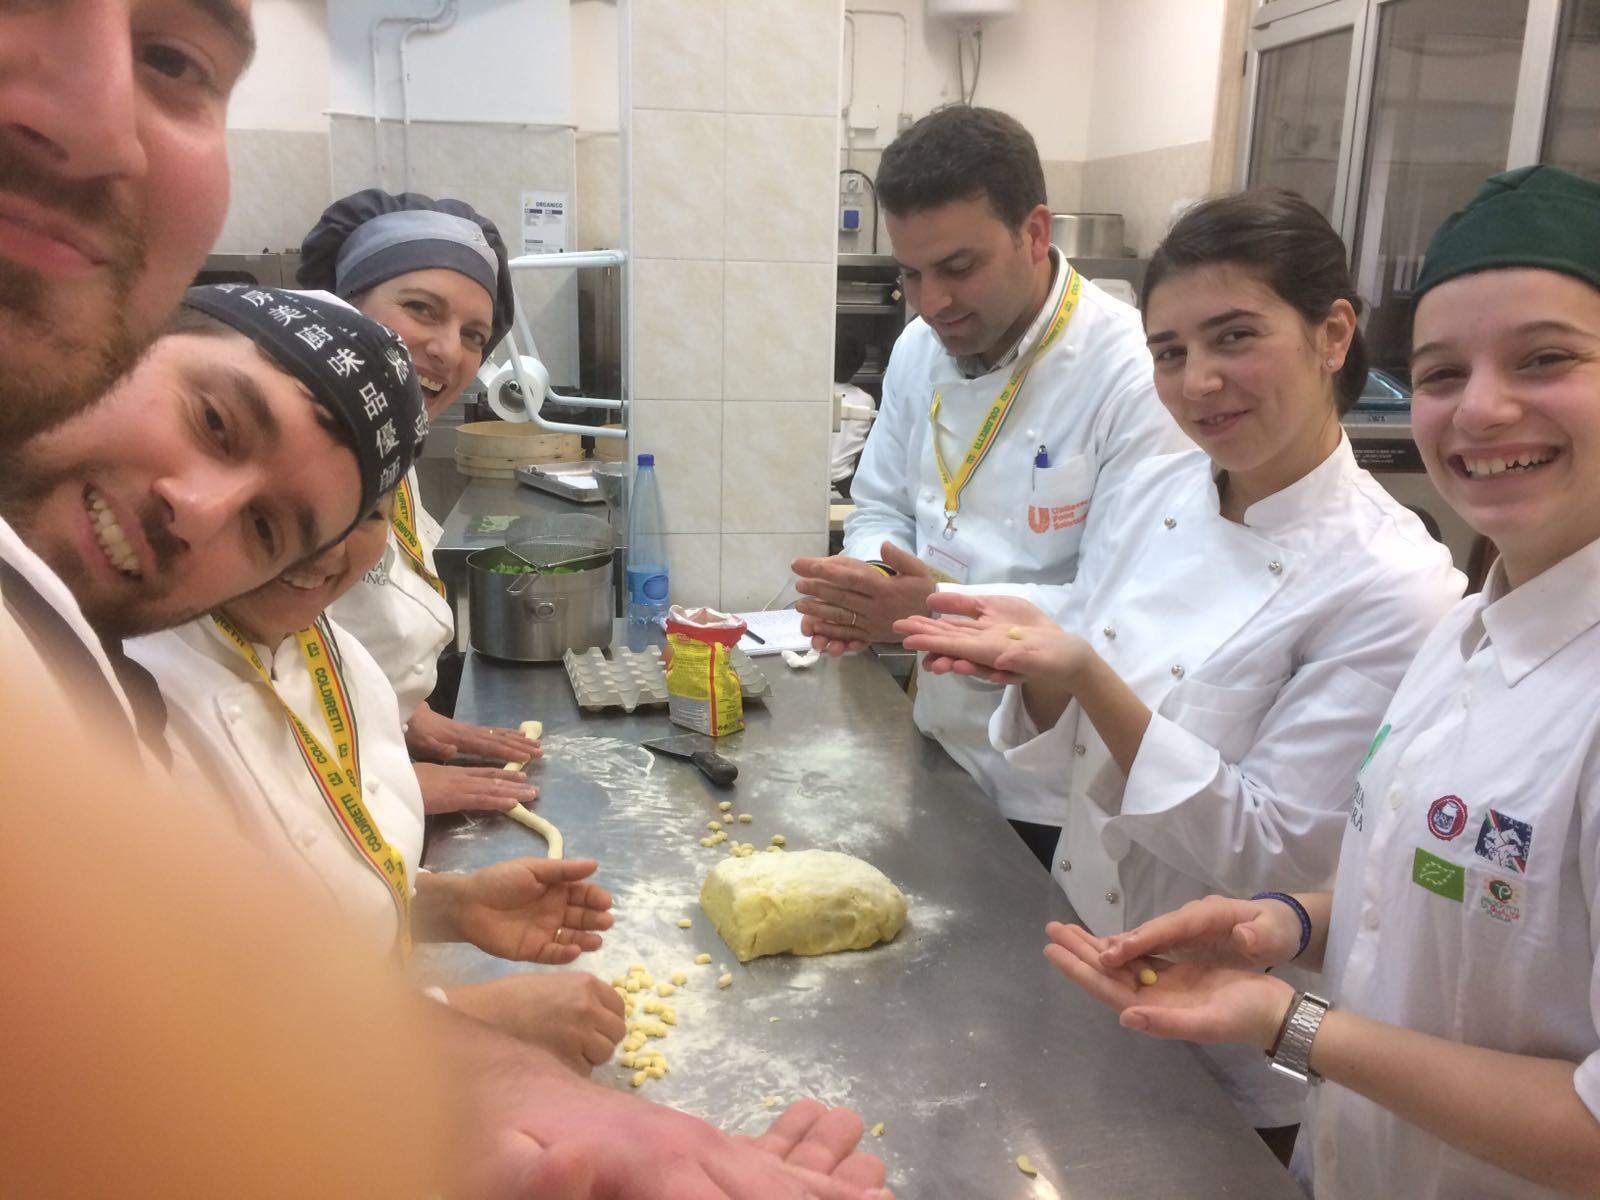 Scuola di cucina rurale coldiretti puglia diplomati - Scuola di cucina a bari ...